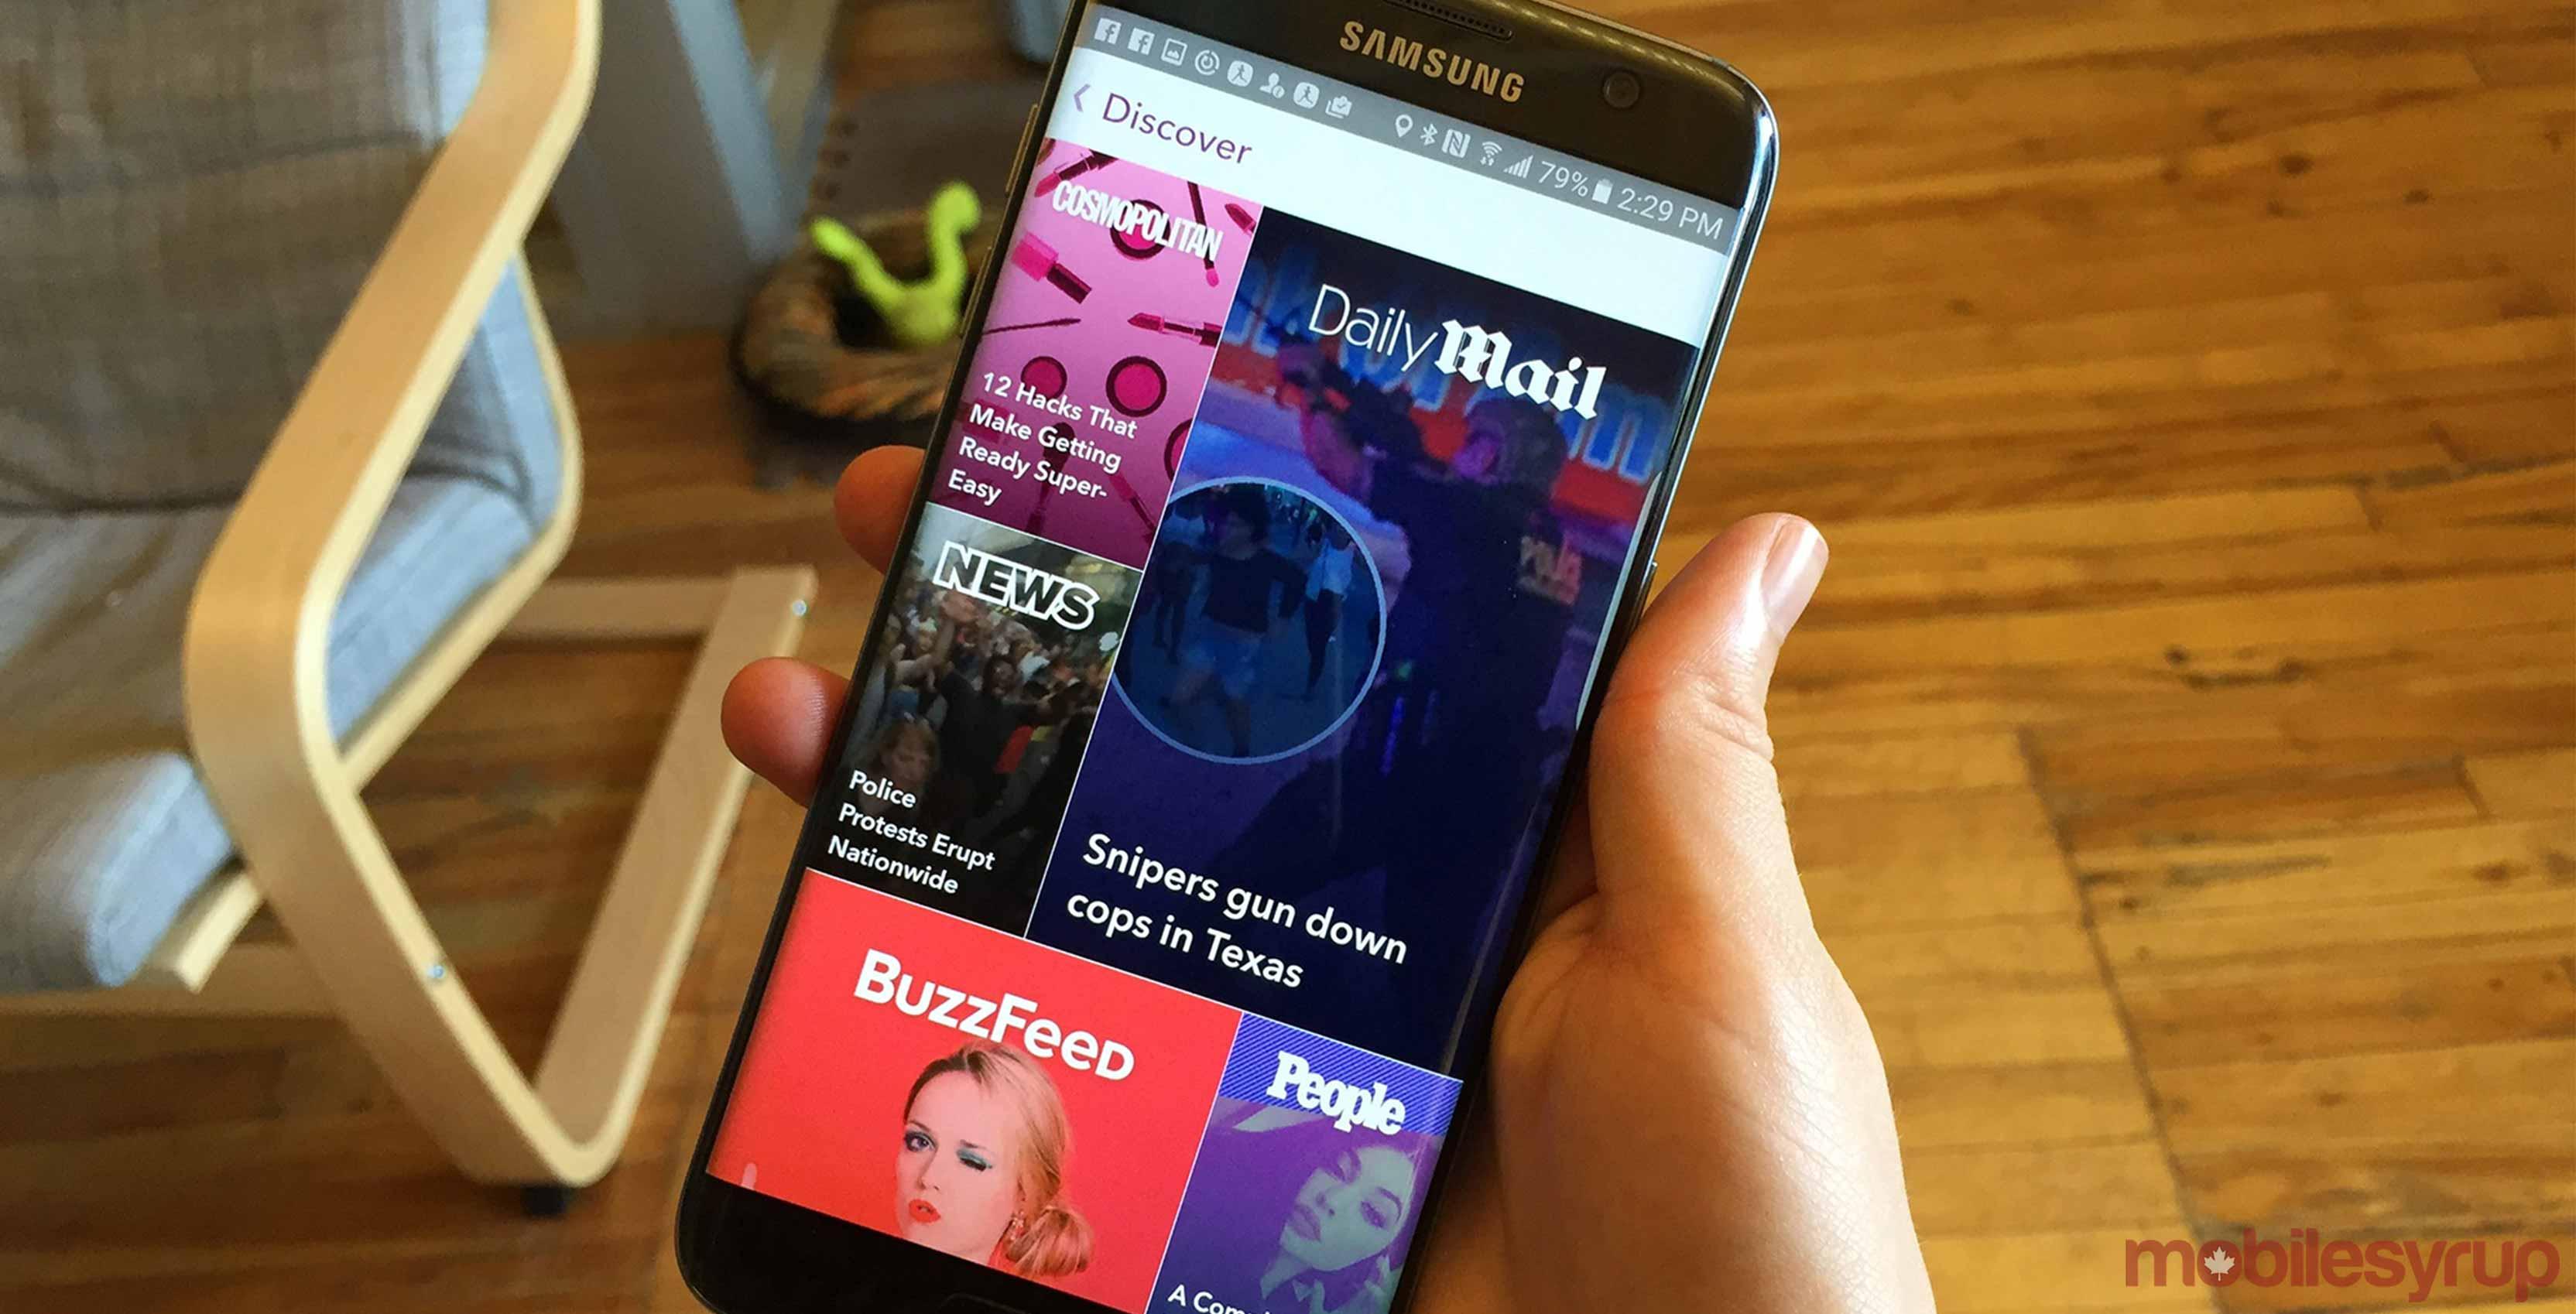 Snap snapchat app on phone